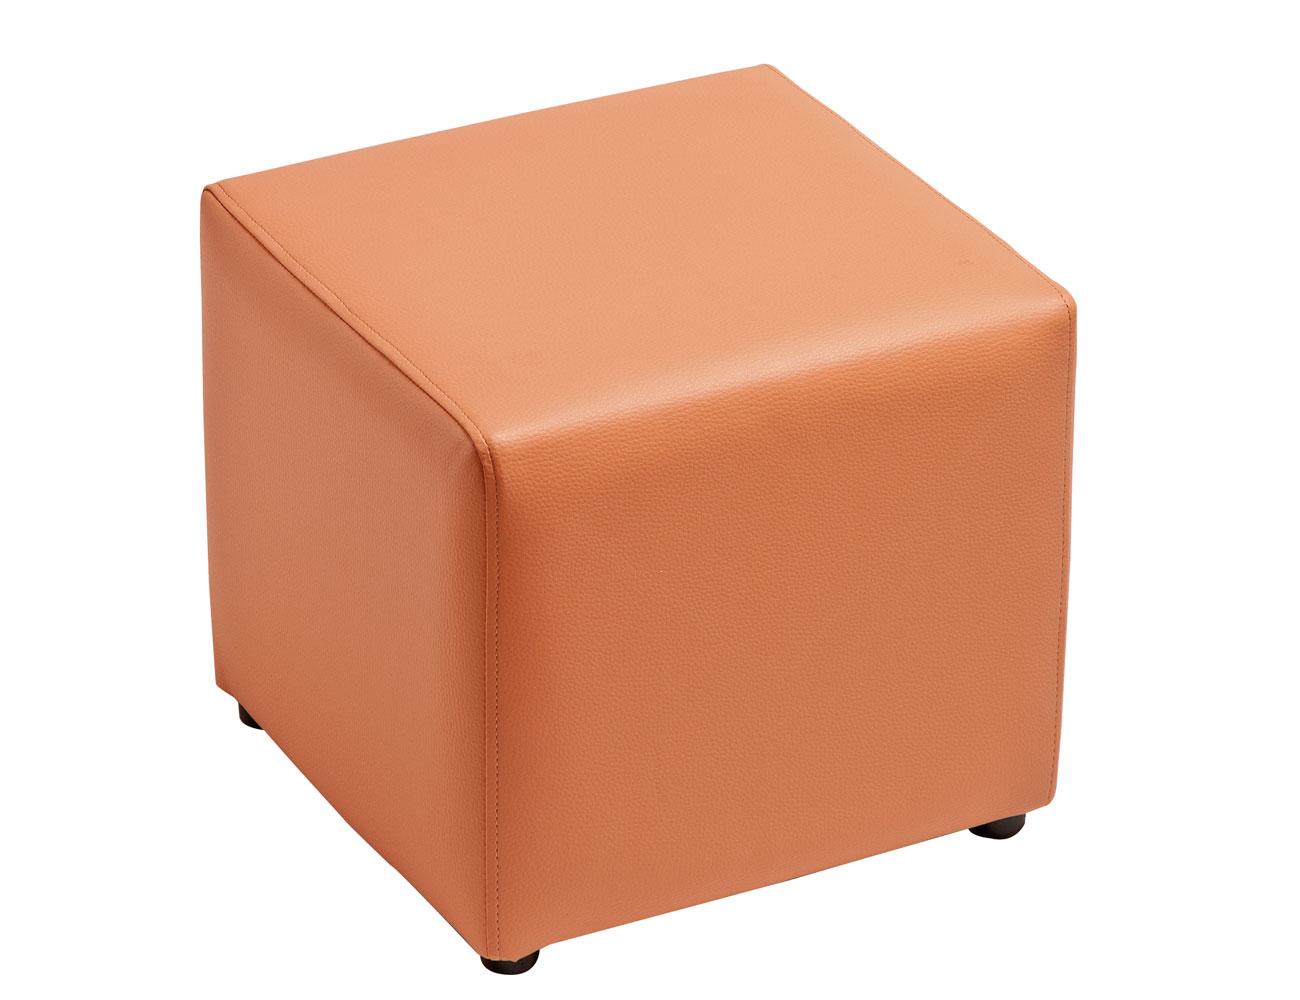 4 cuadrado fijo naranja5